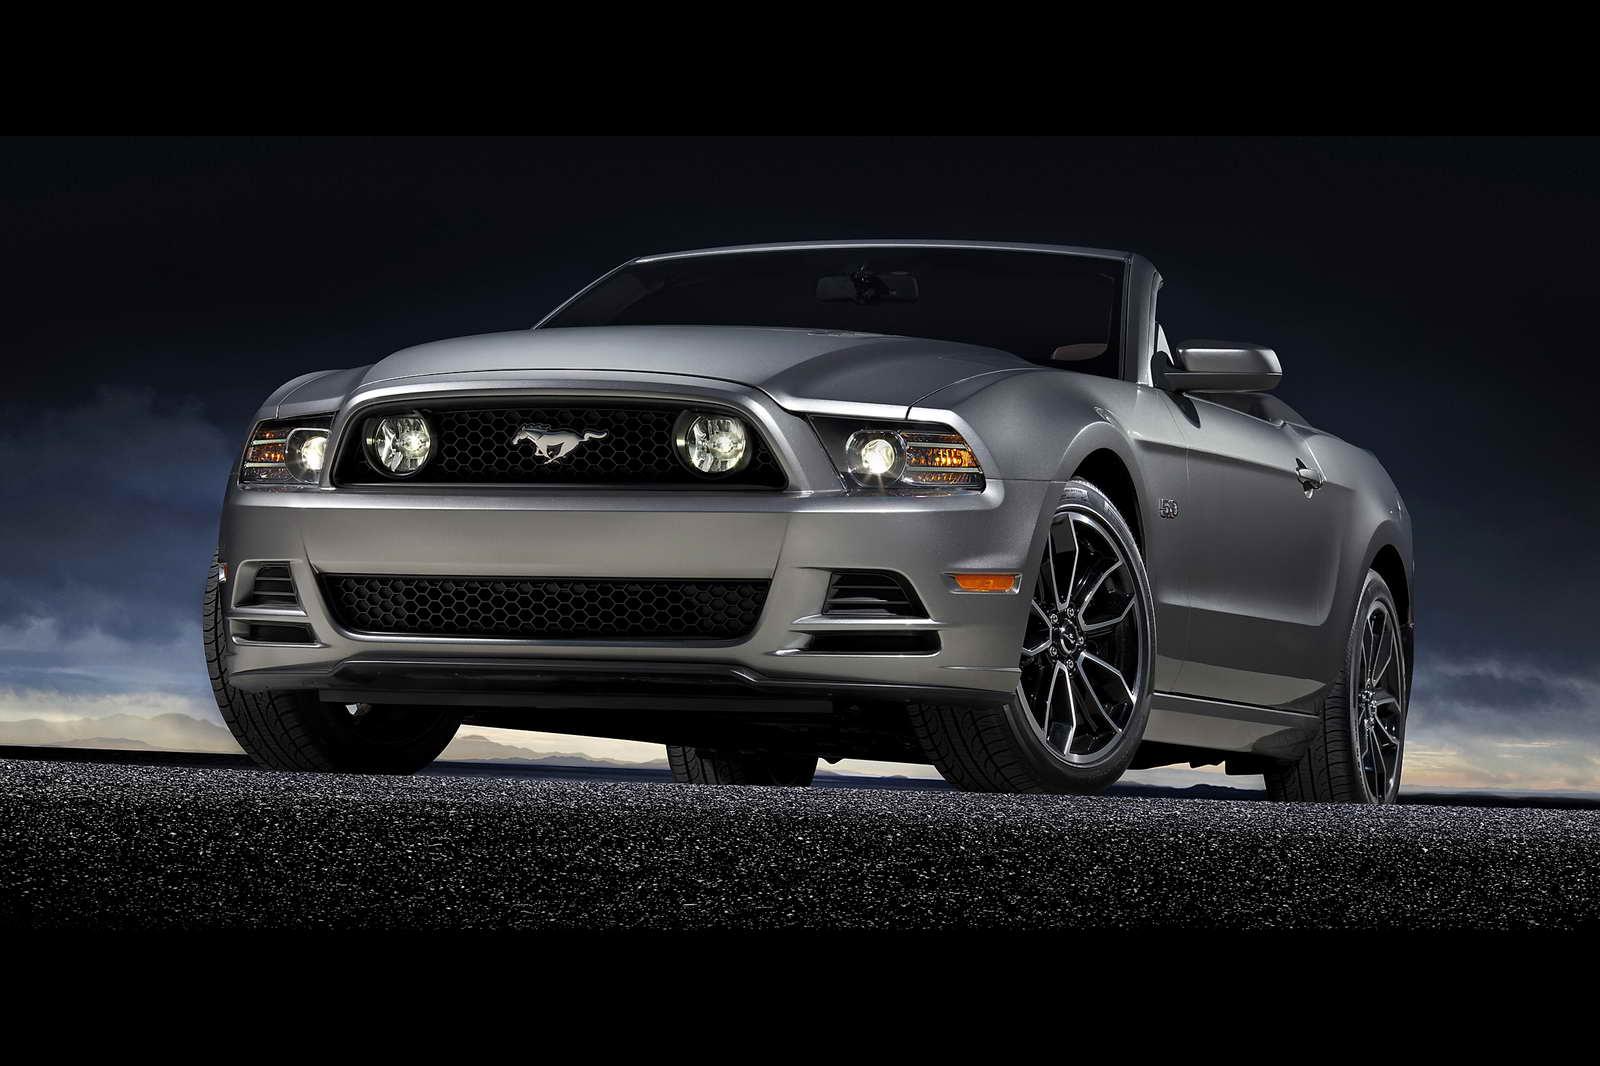 Ford Mustang 2013 IM PRESIONANTE